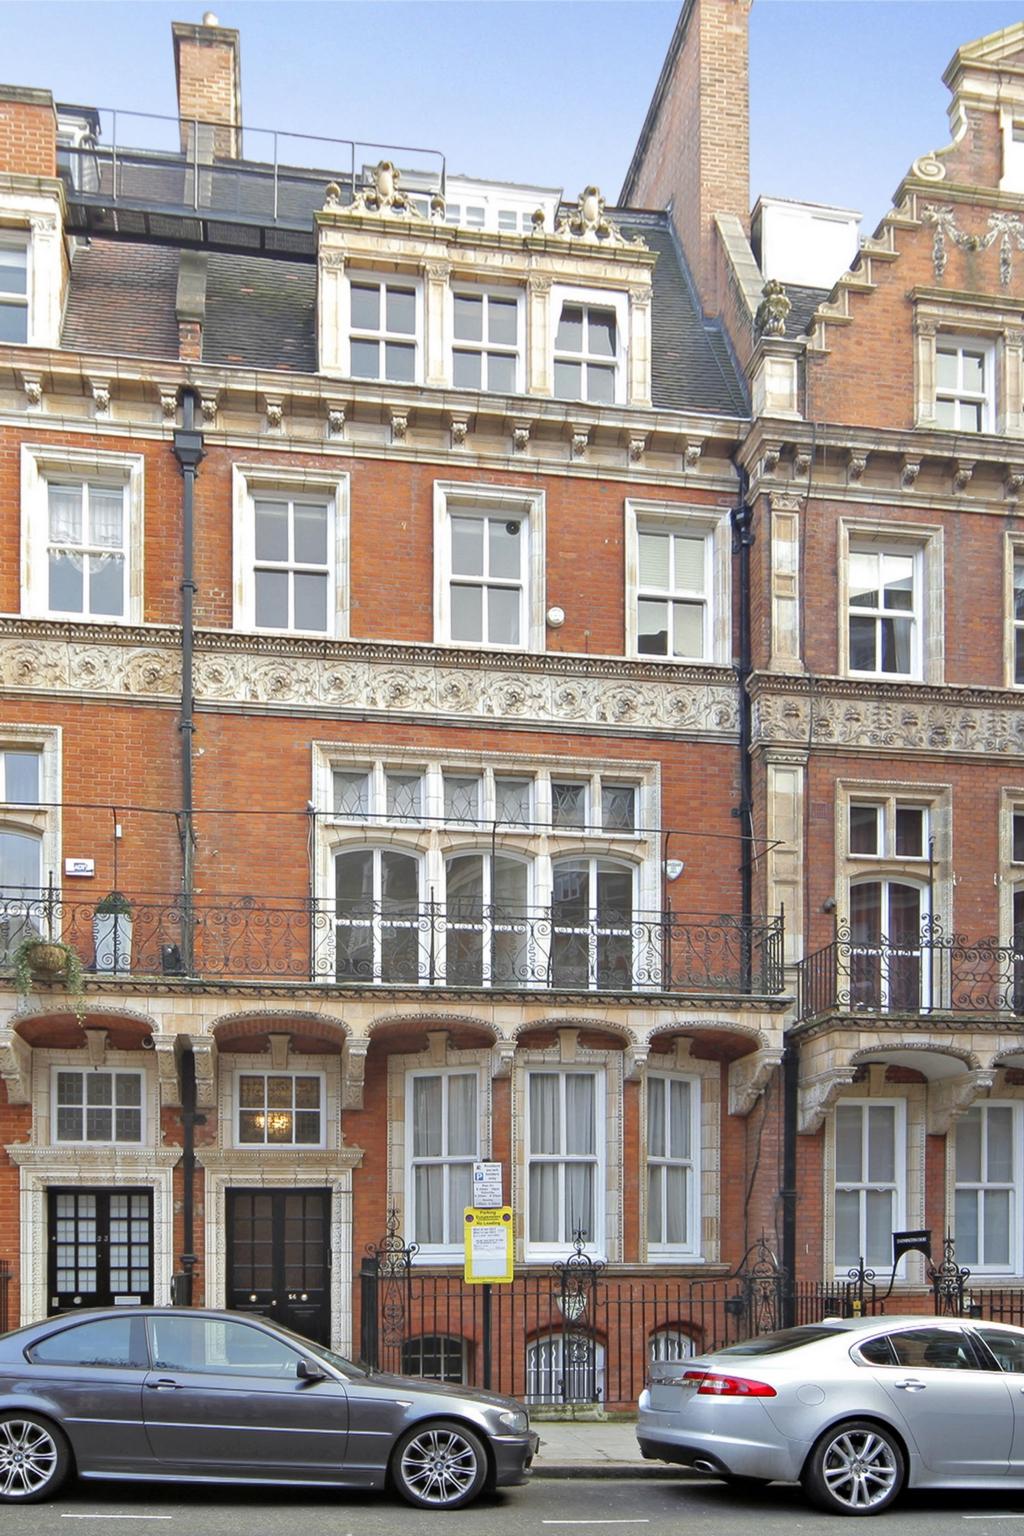 Kensington Court  Kensington  W8